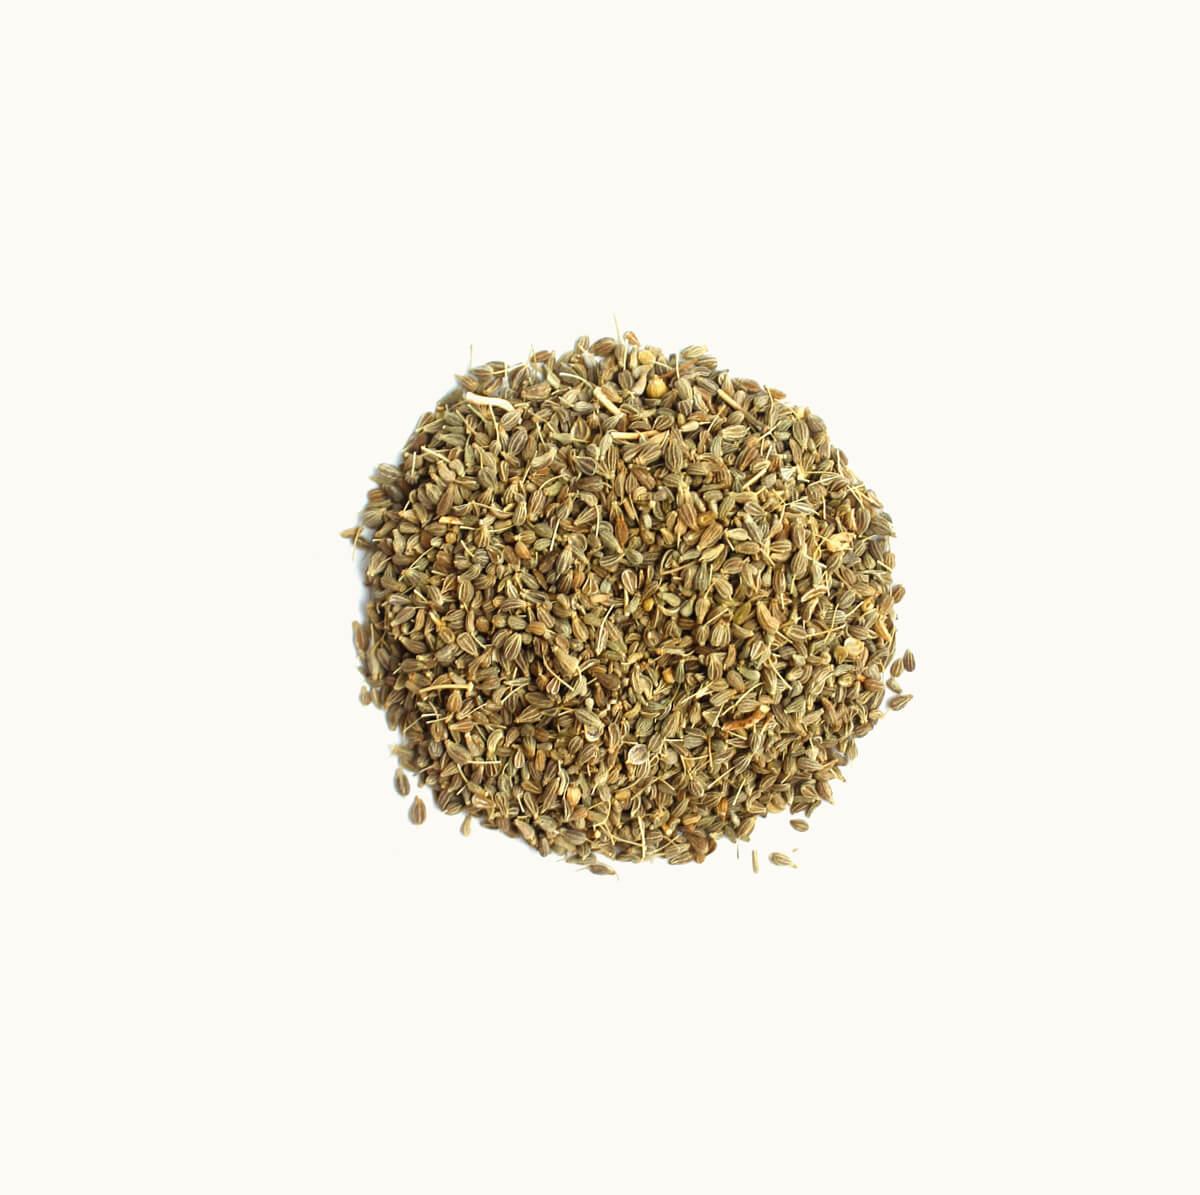 ERVA DOCE - Pimpinella anisum - 30g